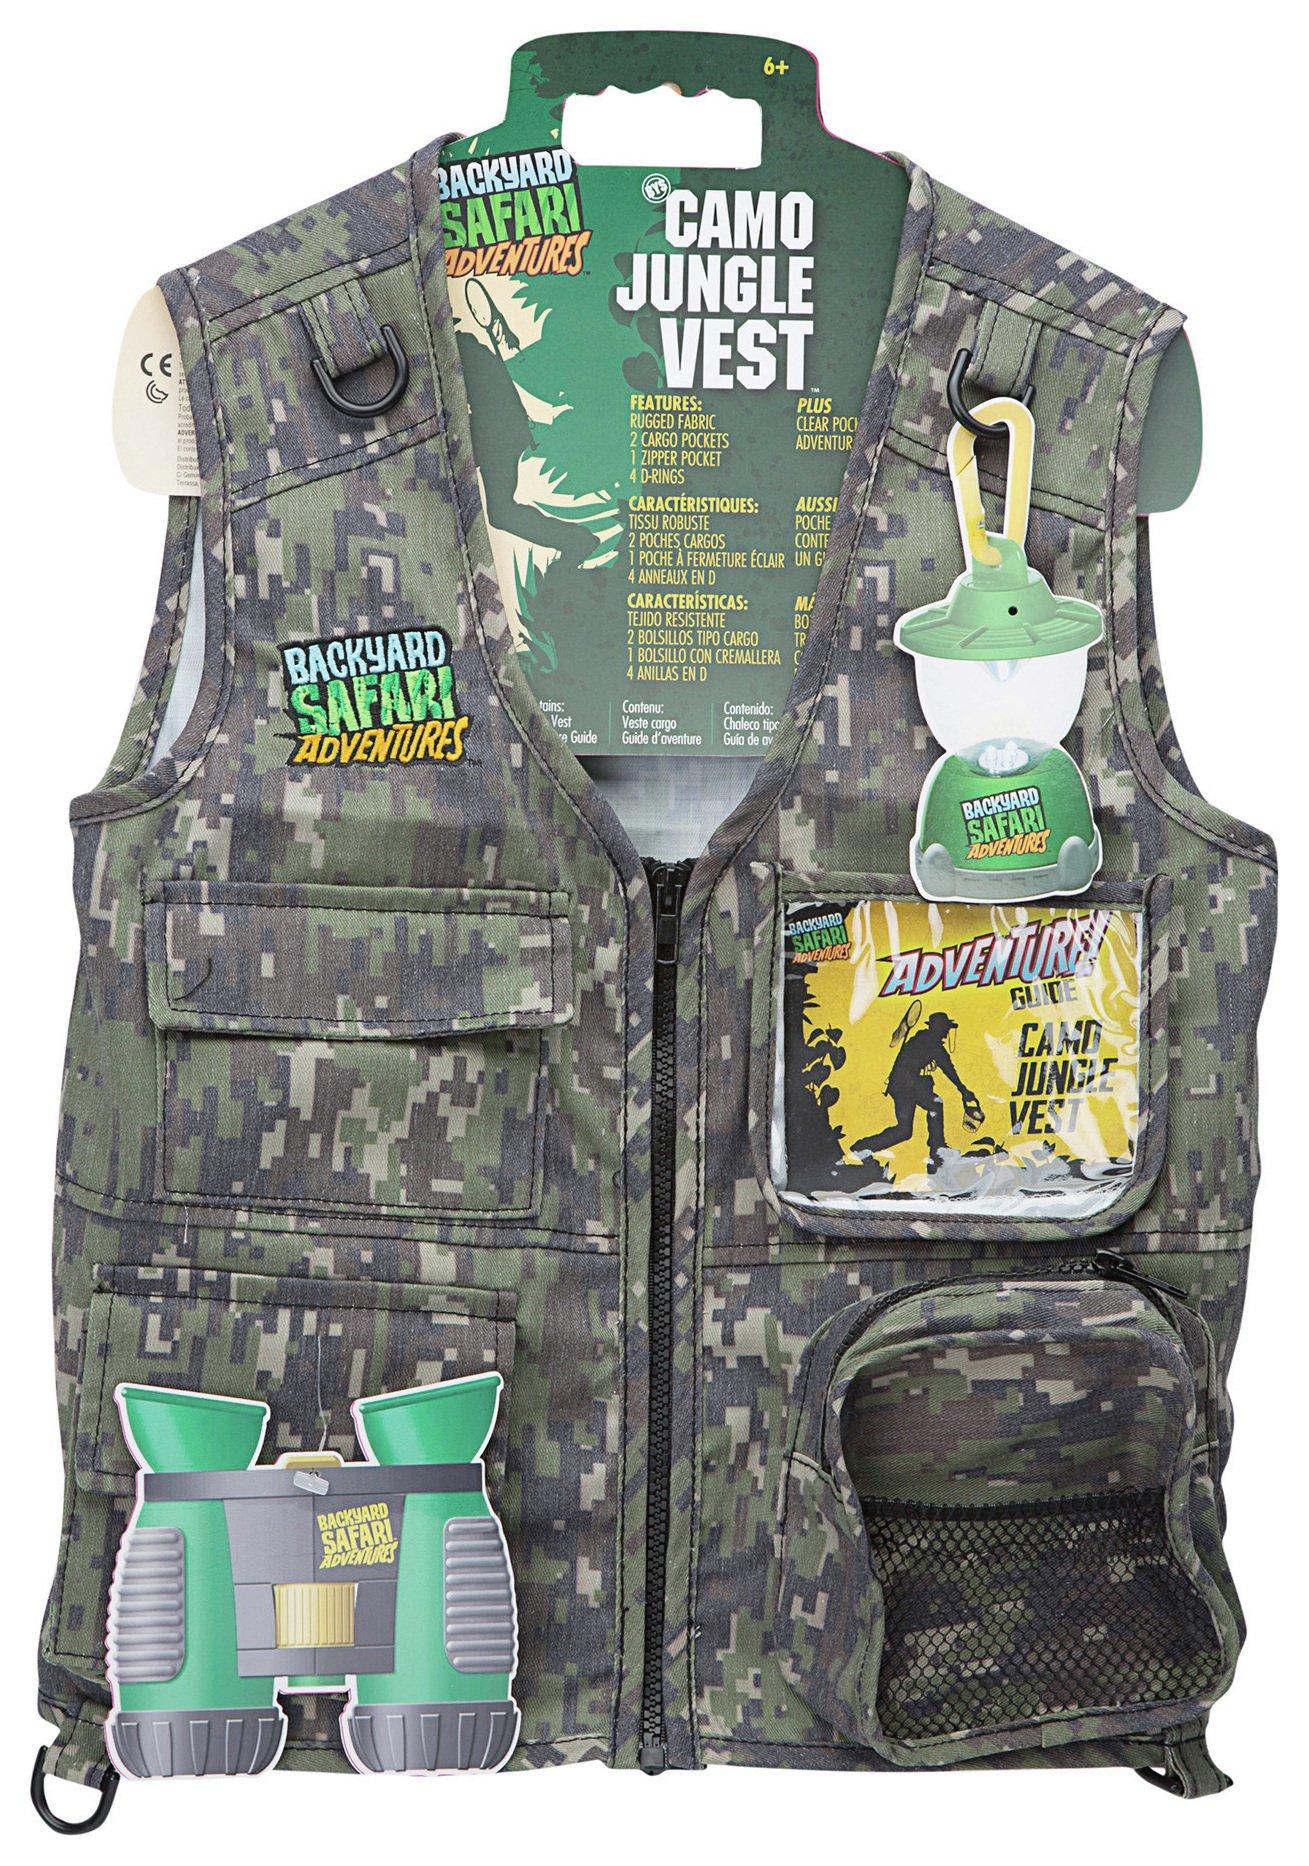 Image of Alex Toys Backyard Safari Jungle Camo Vest.